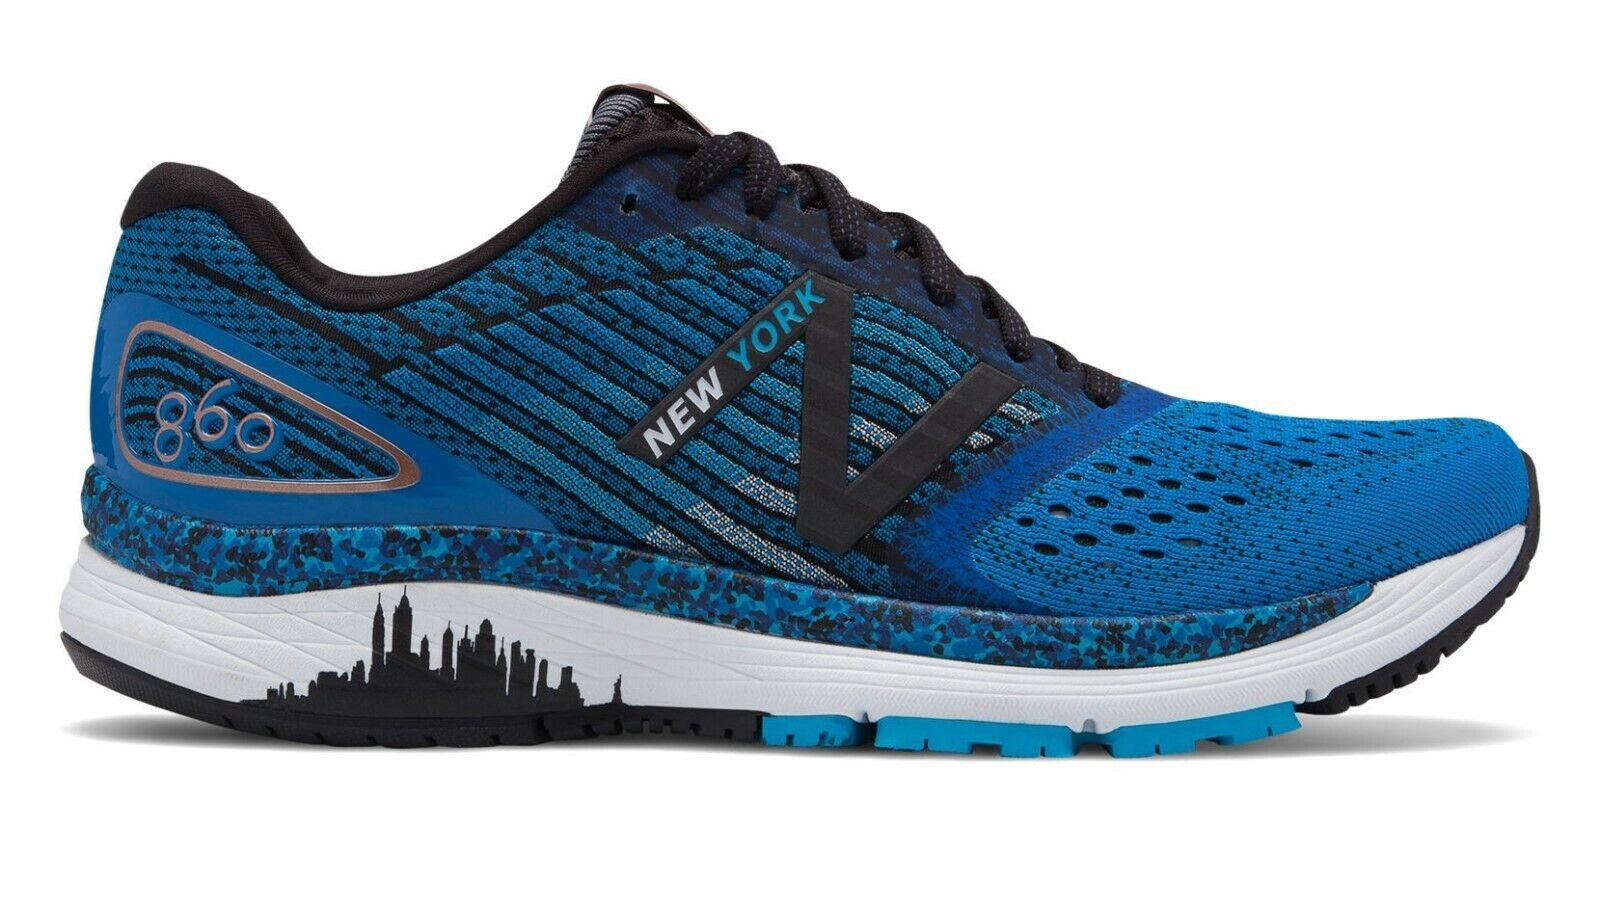 Nuevo Para hombres NEW 890 NY v9.0 correr BALANCE Zapatos - 15 50 euros-NUEVO YORK maratón